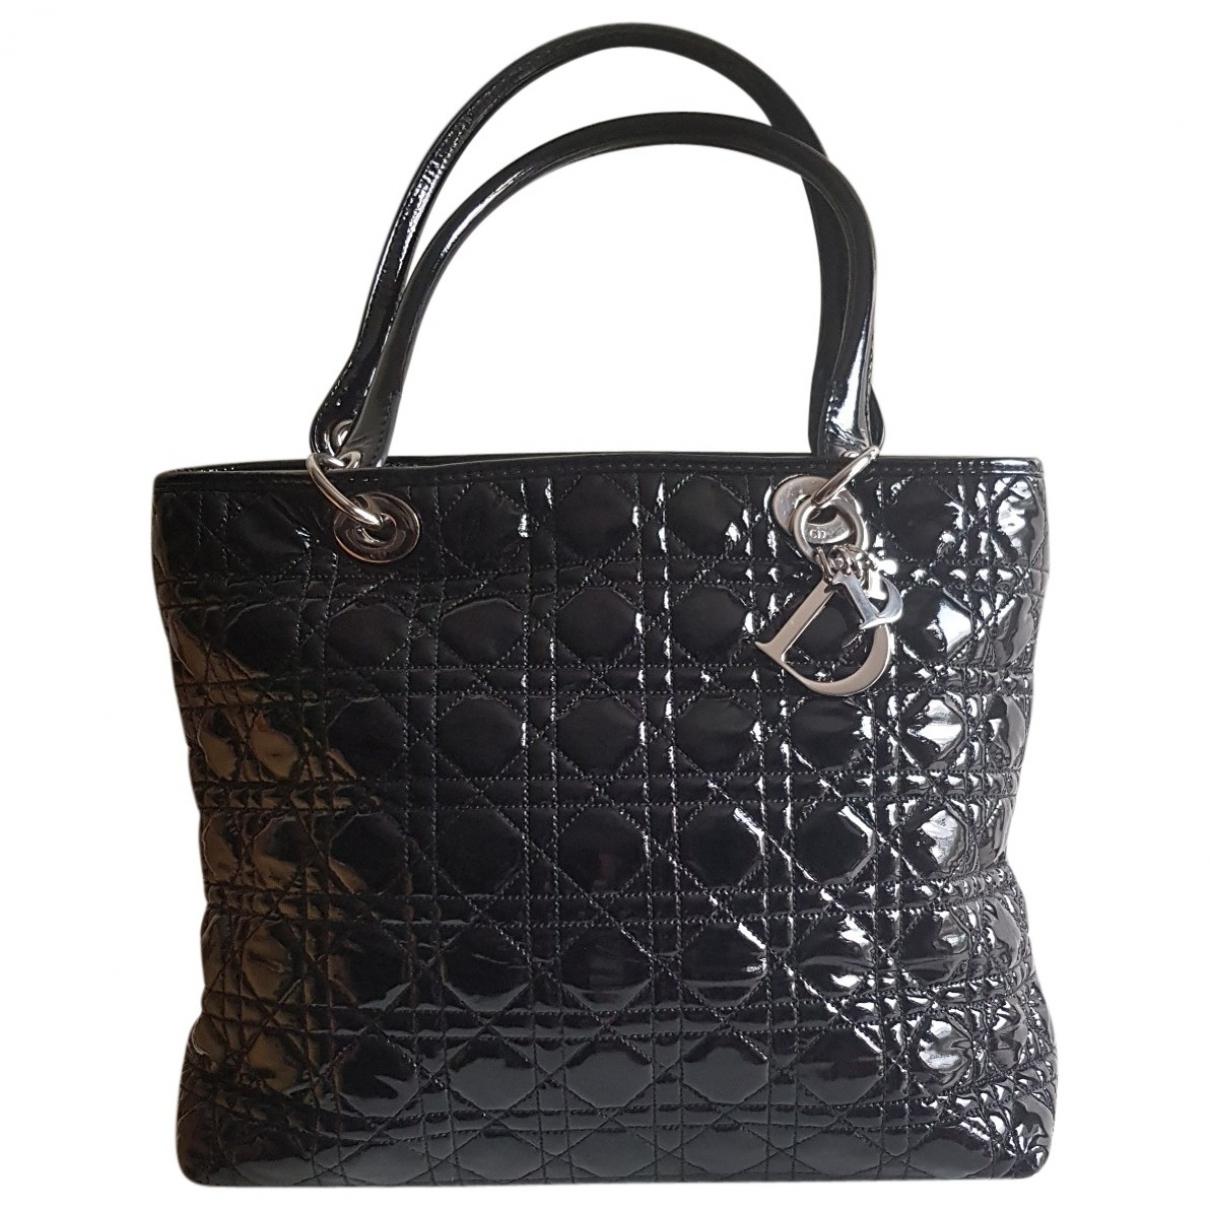 Dior Dior Soft Shopping Black Patent leather handbag for Women \N